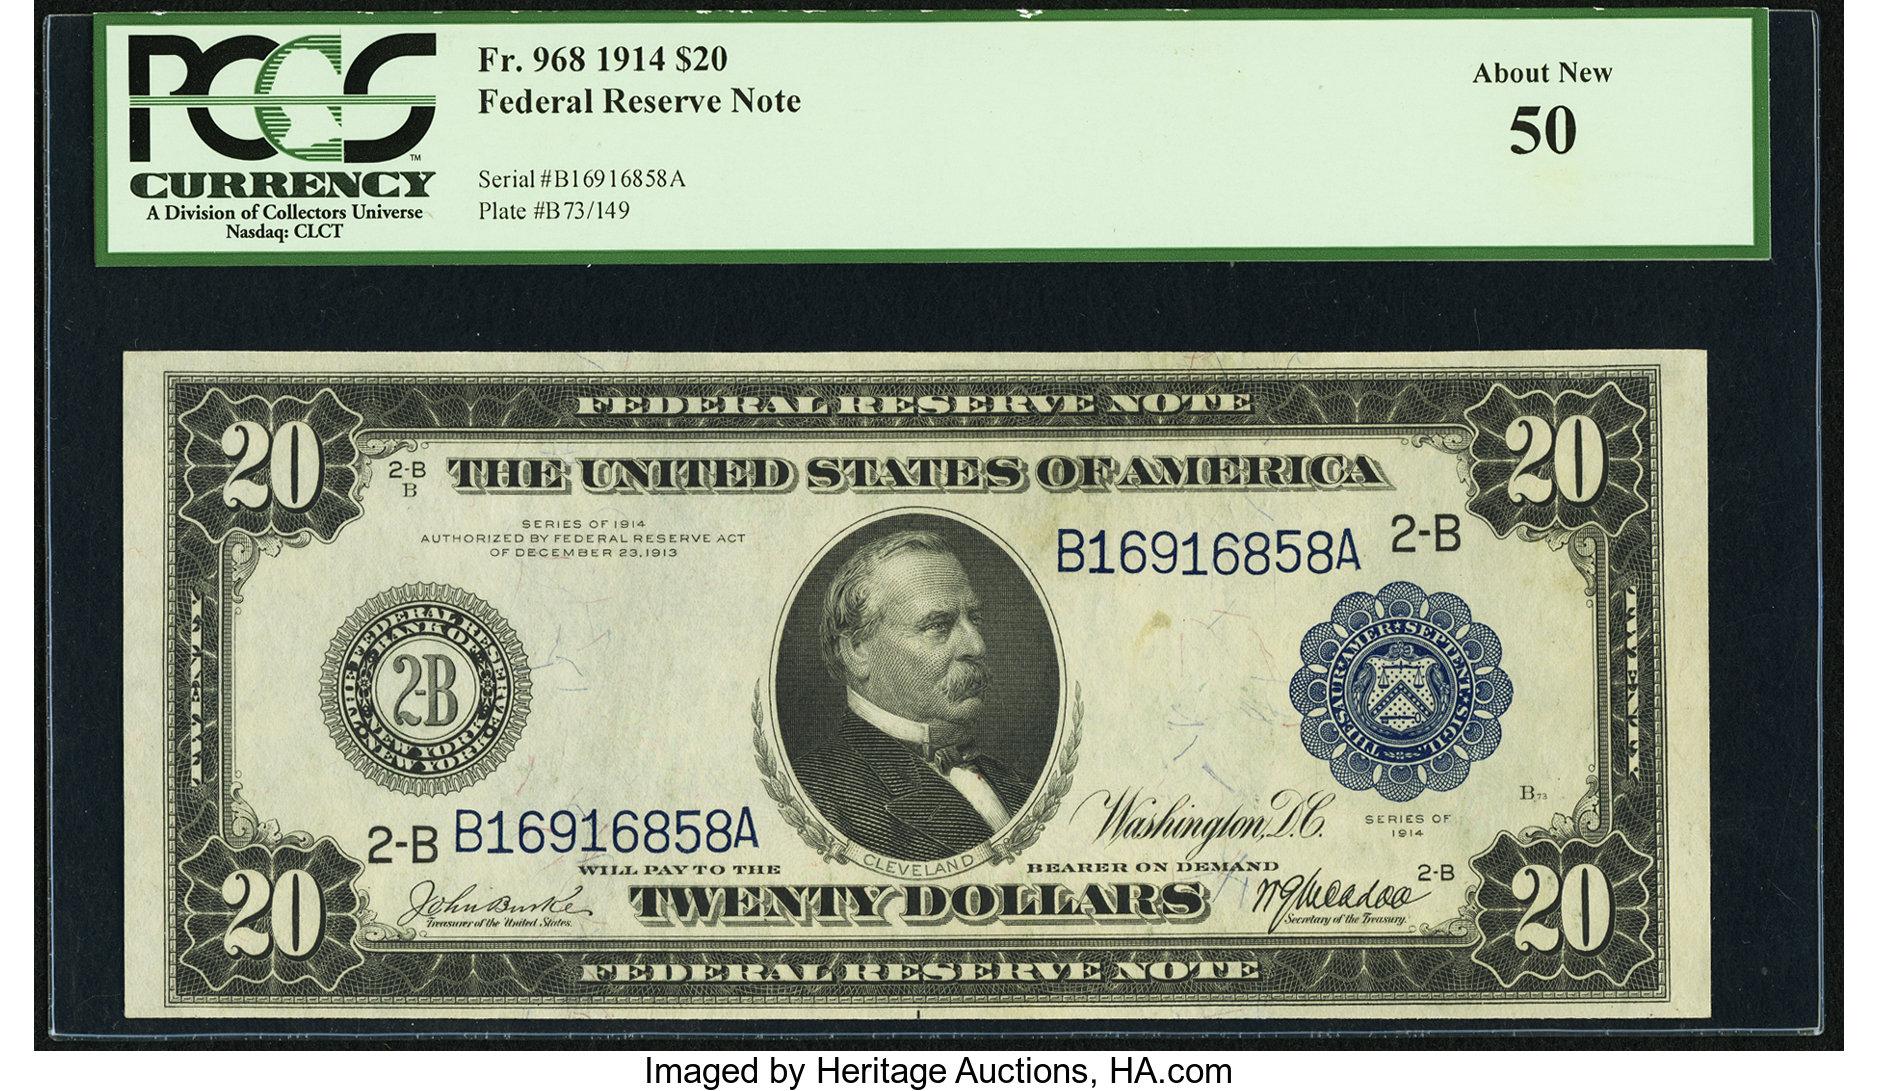 sample image for Fr.968 $20 NY